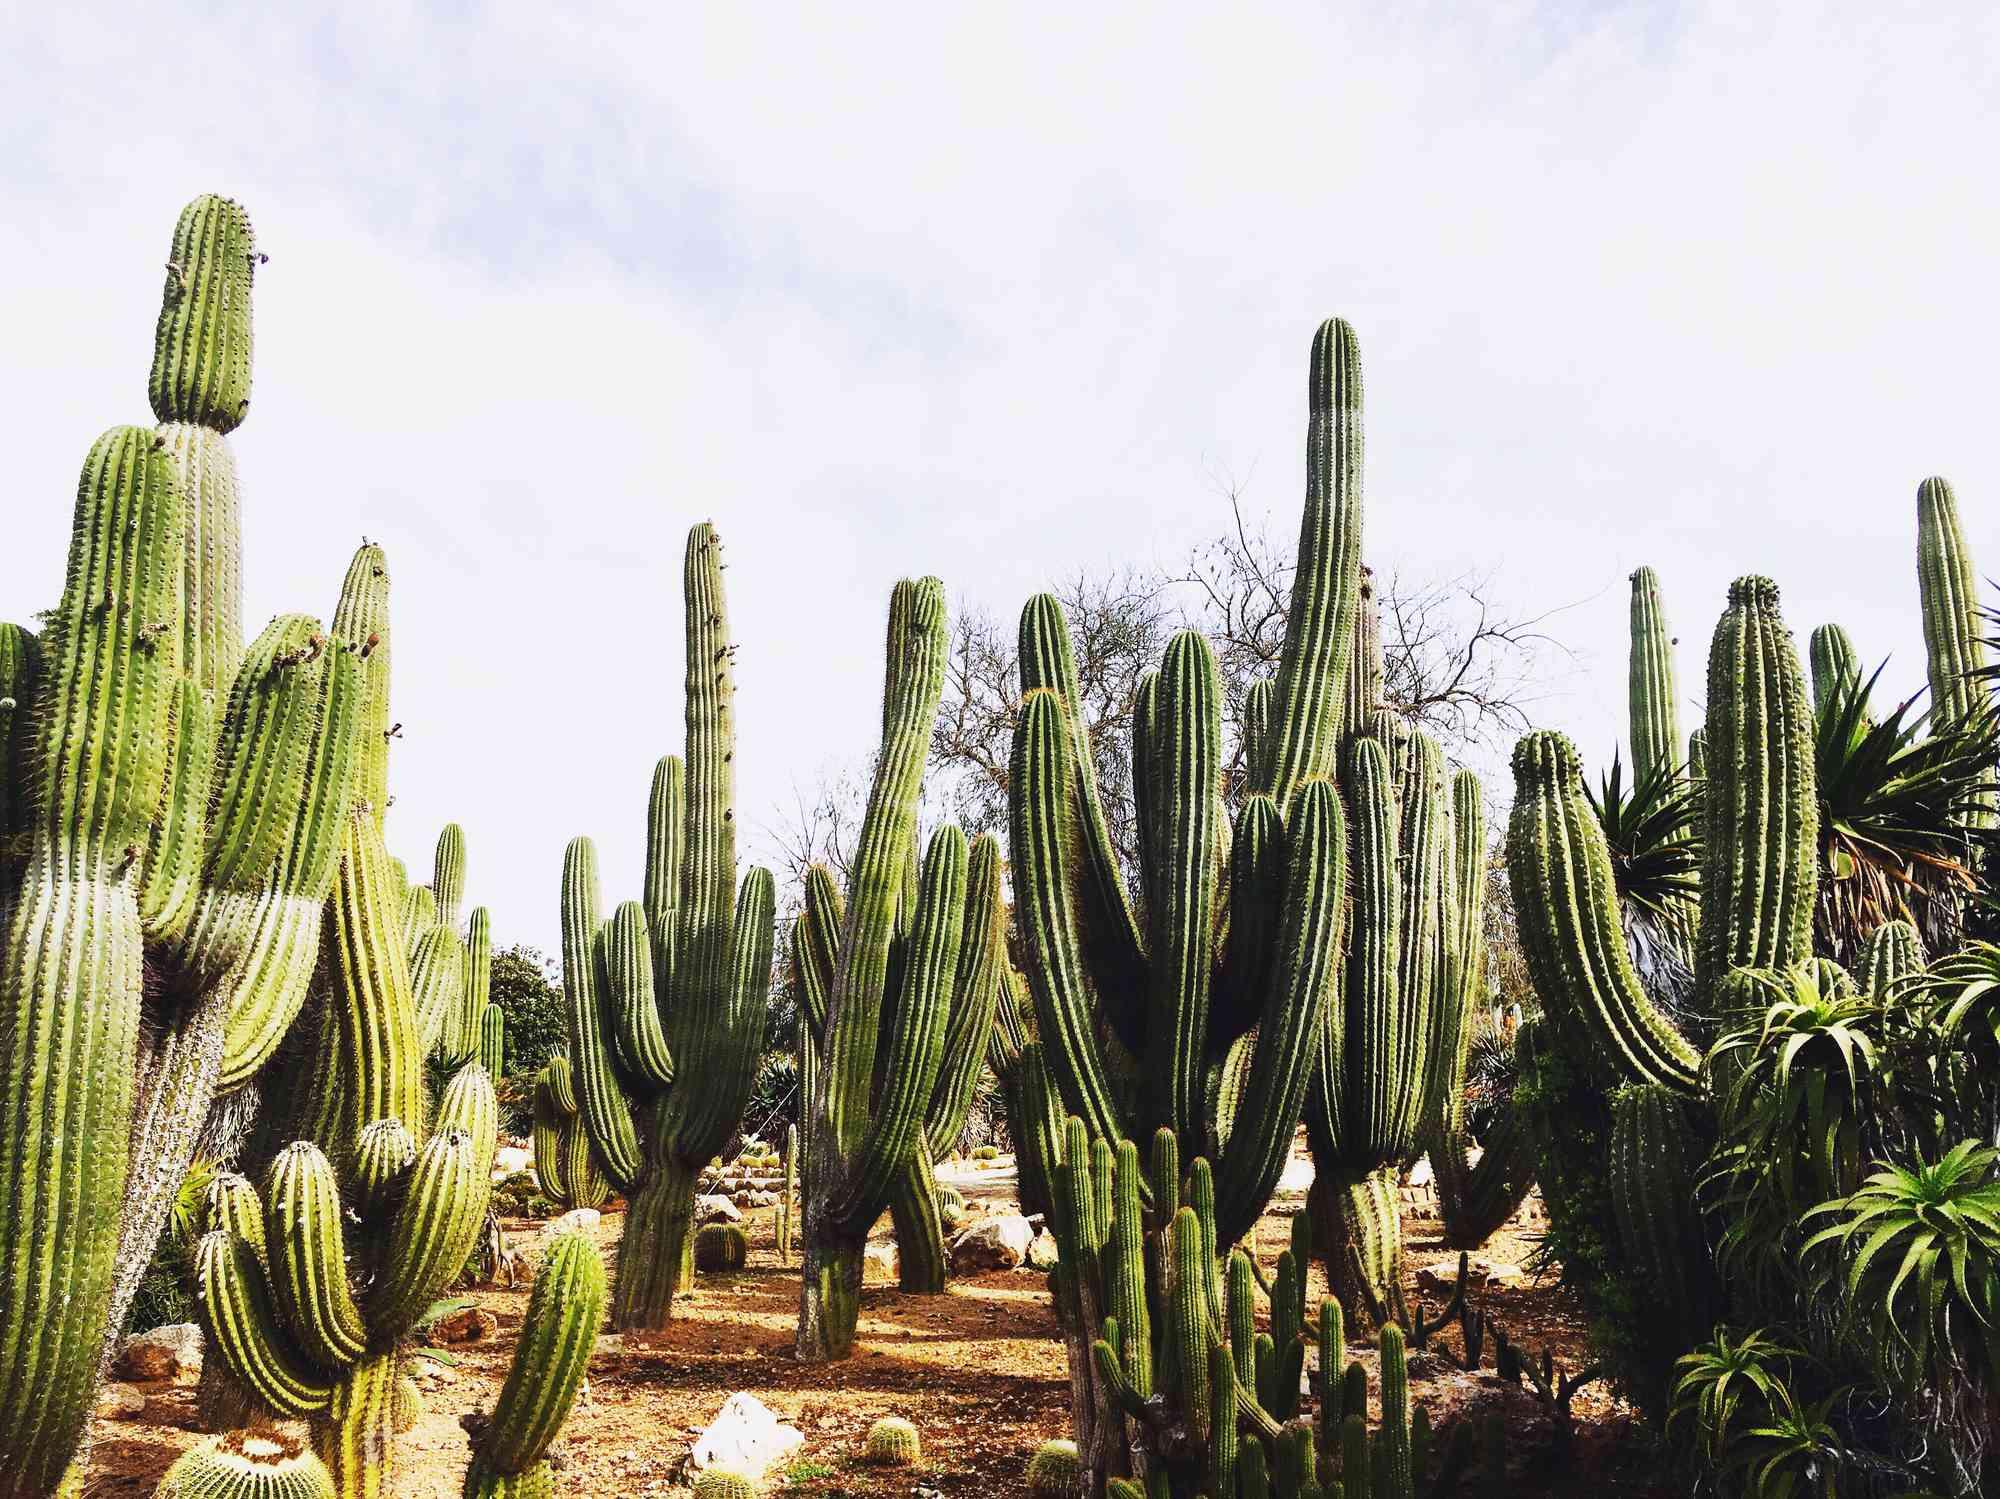 Field of saguaro cactus